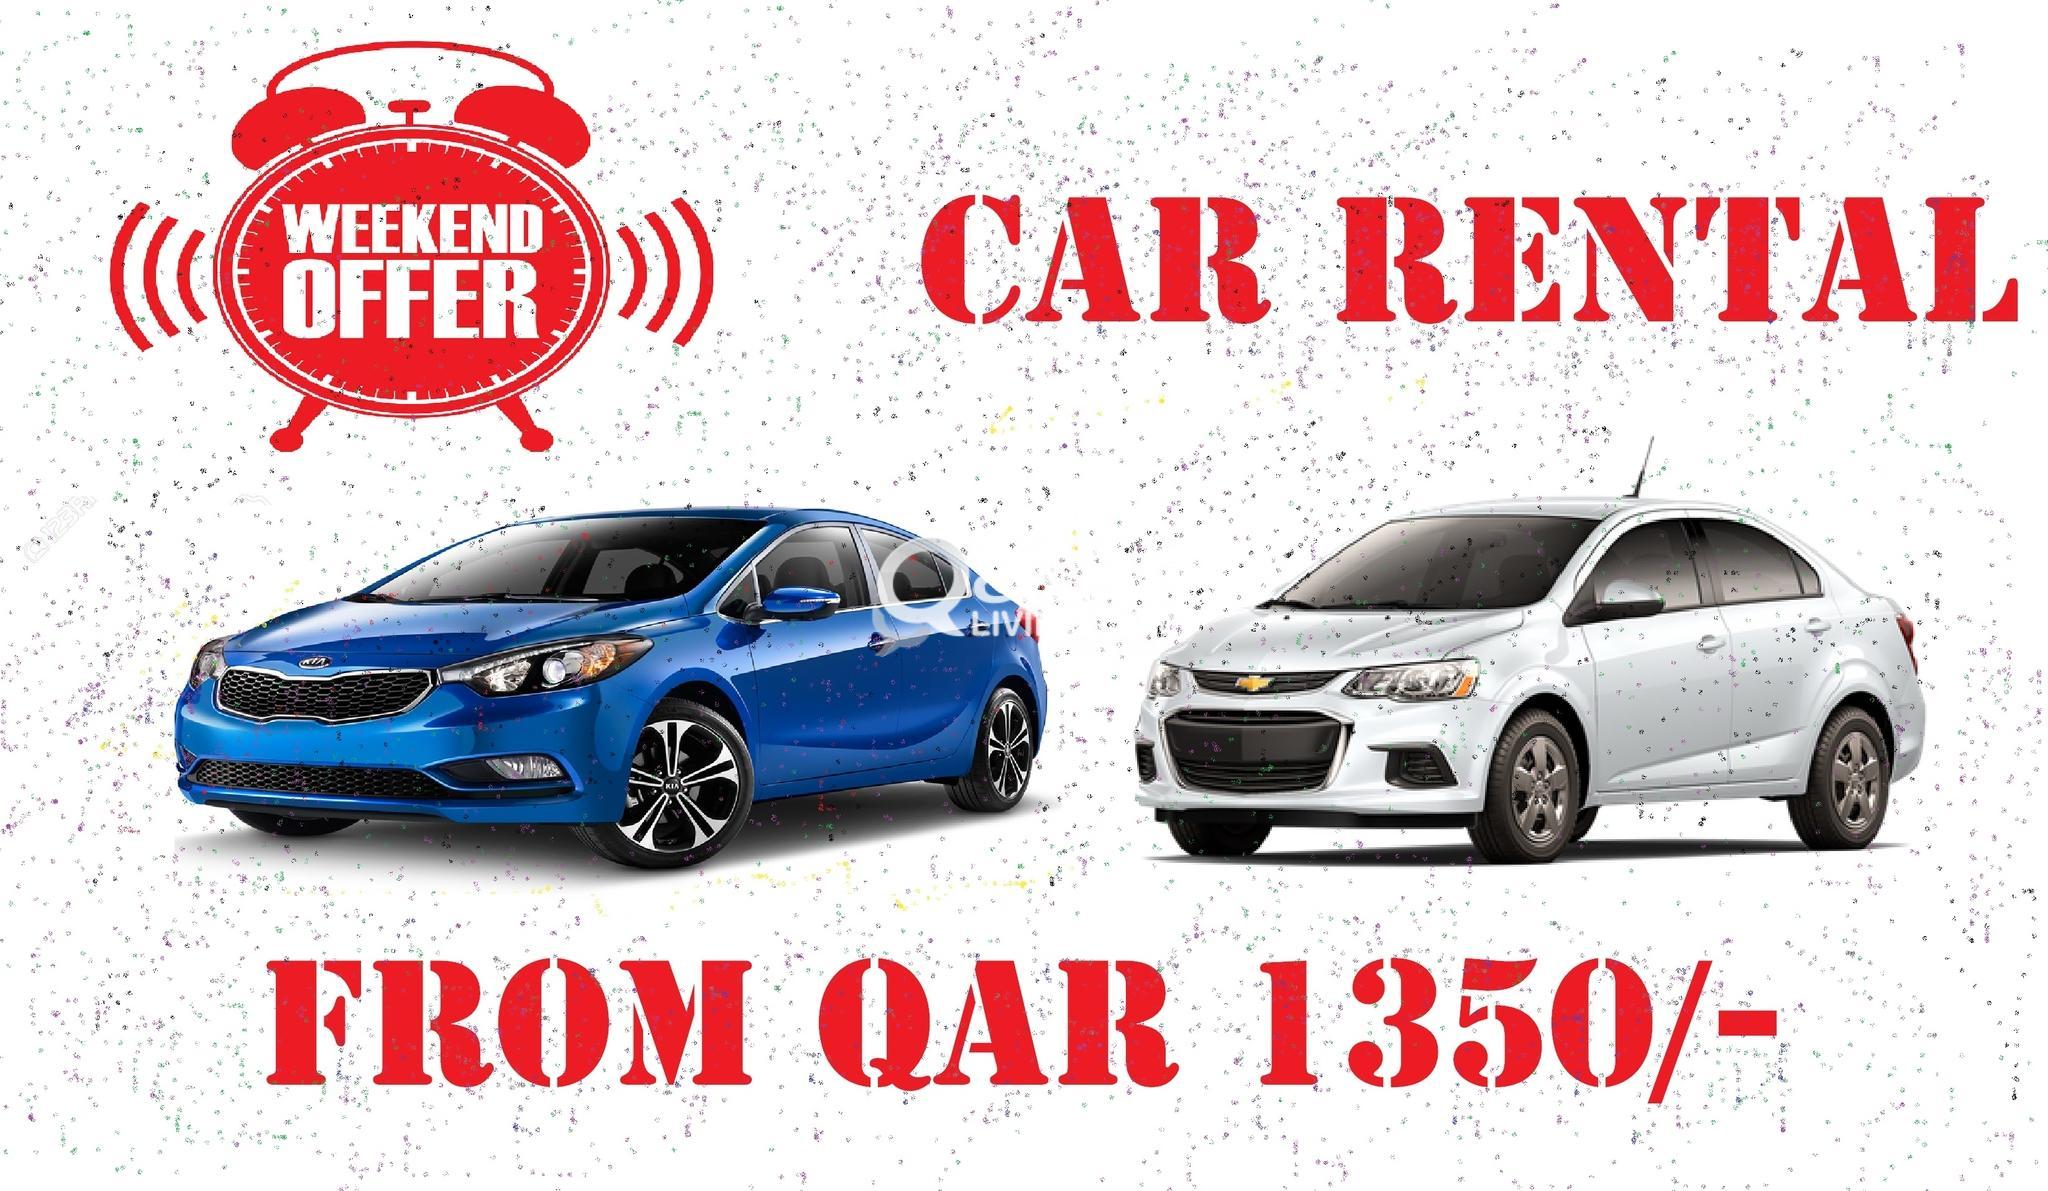 Weekend Offer for Car Rental